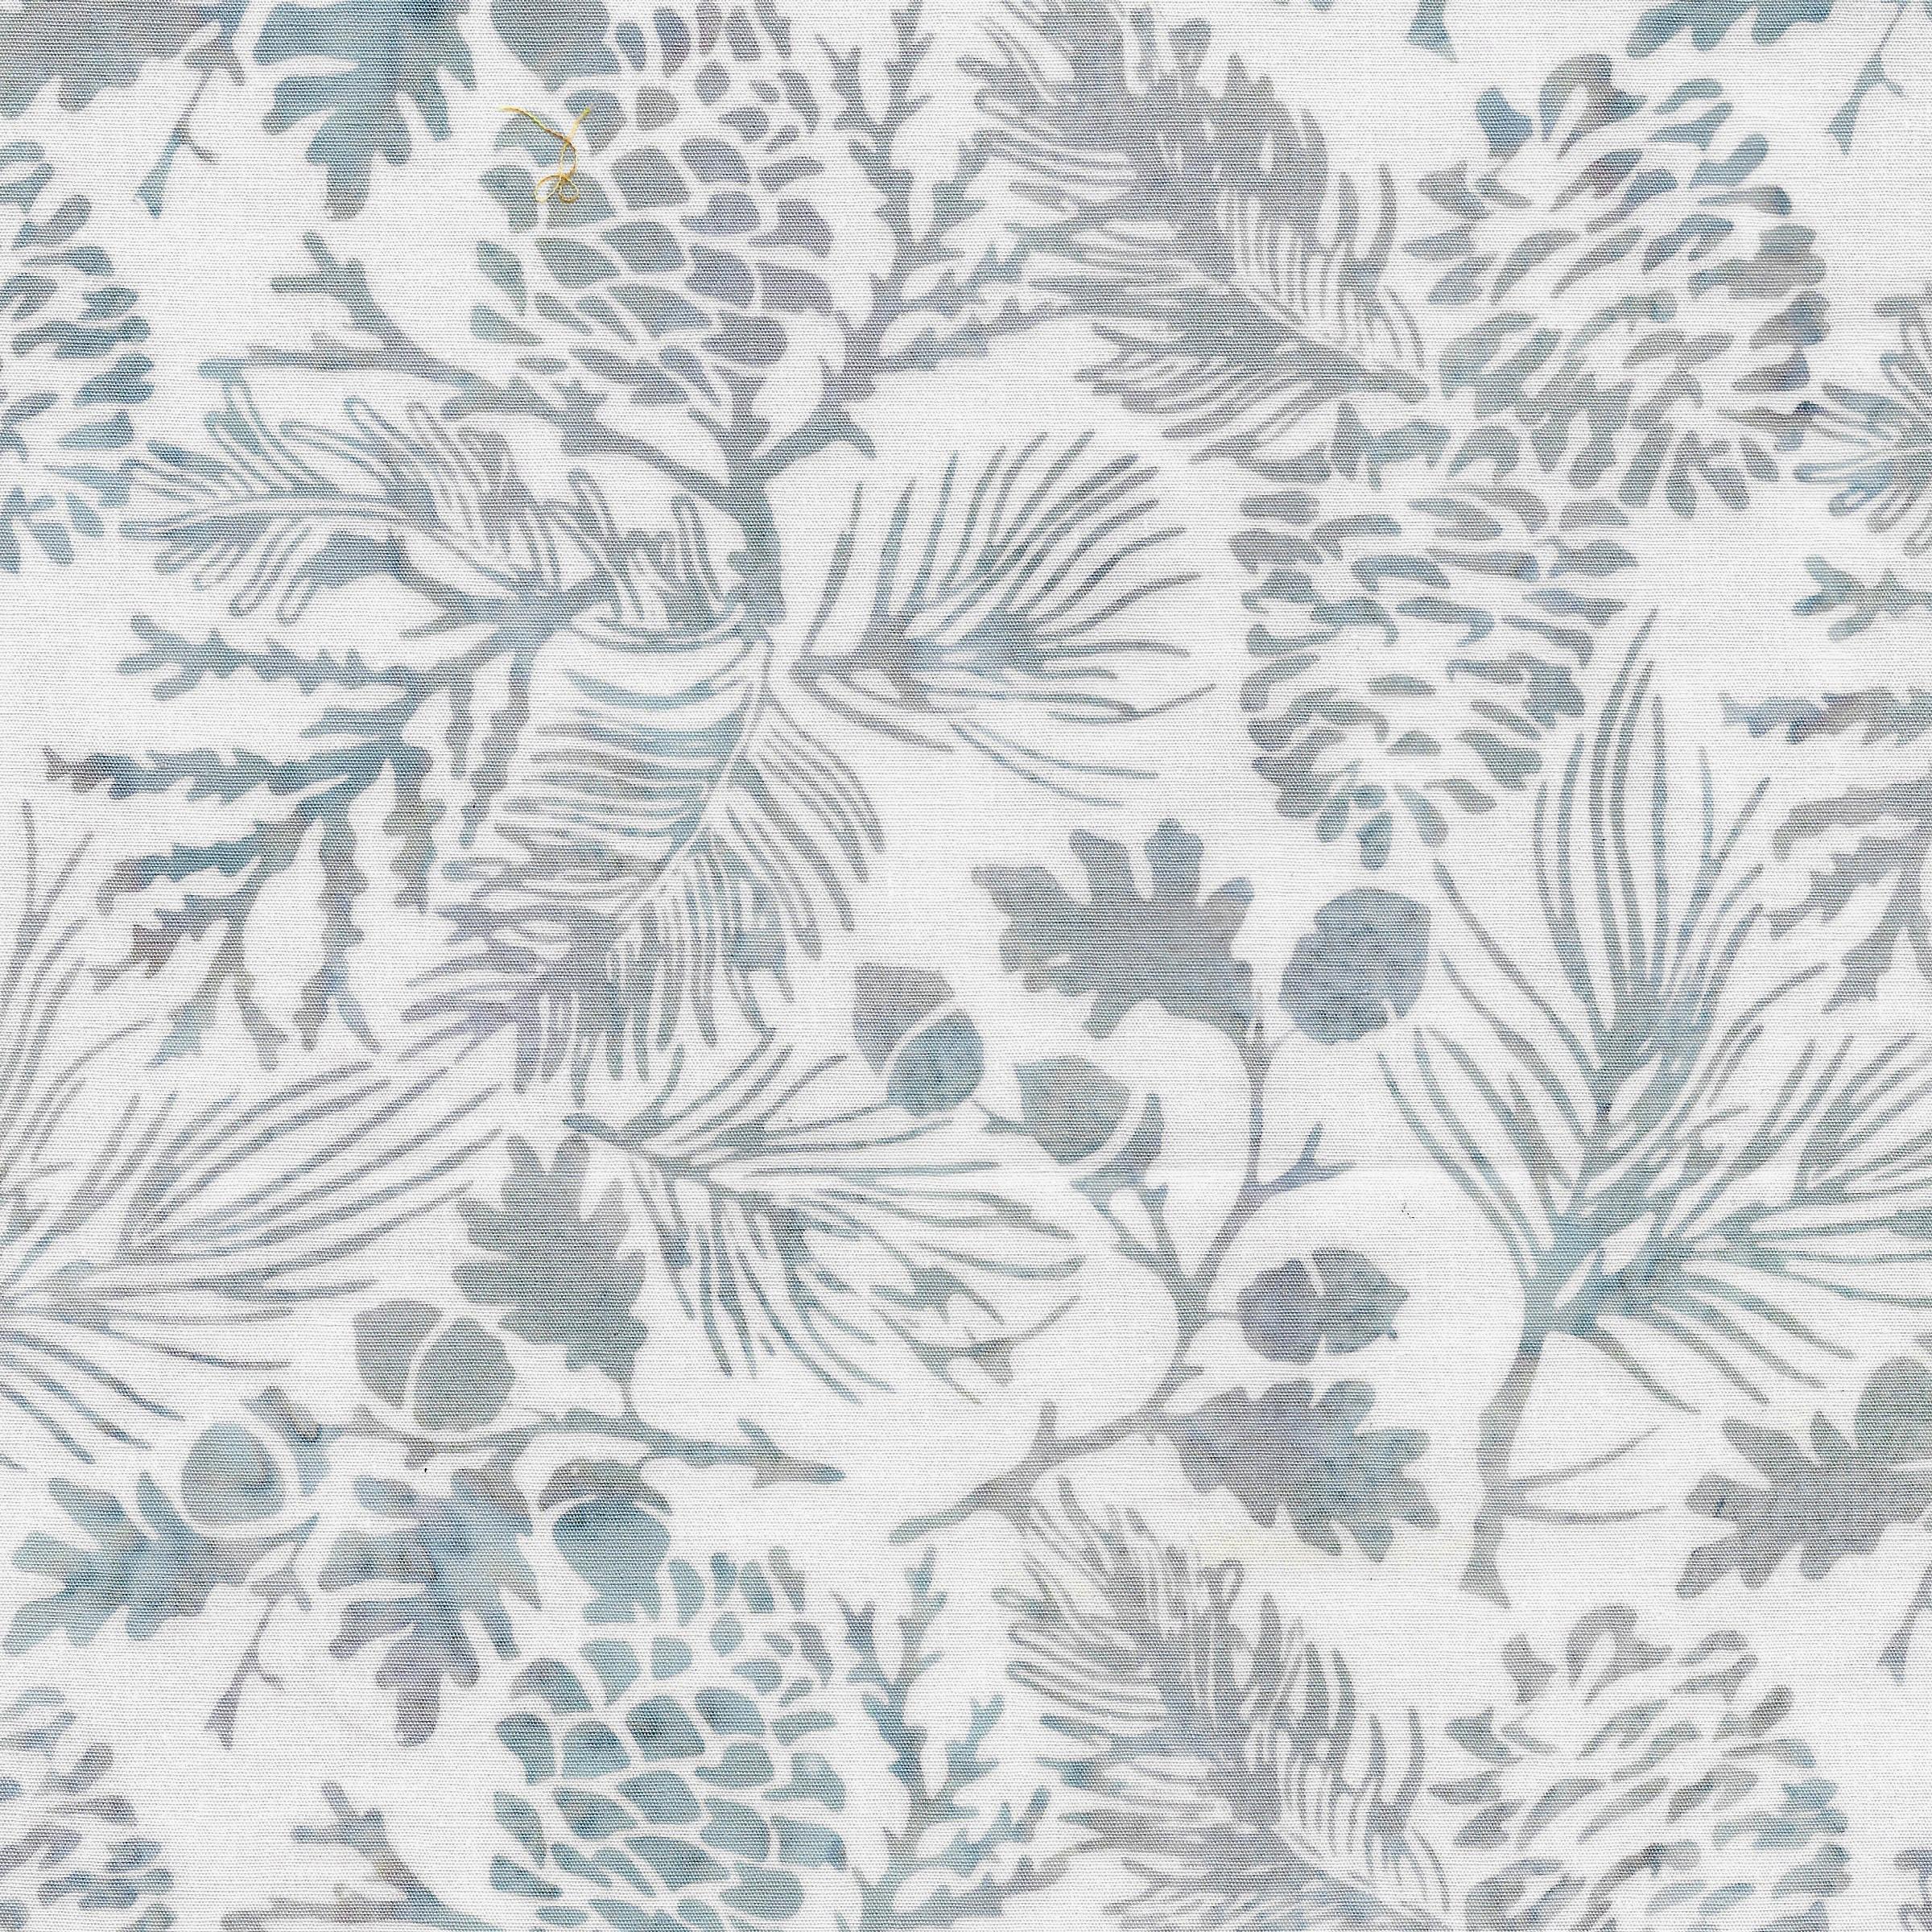 Design/Chop Name:Pine Leaf